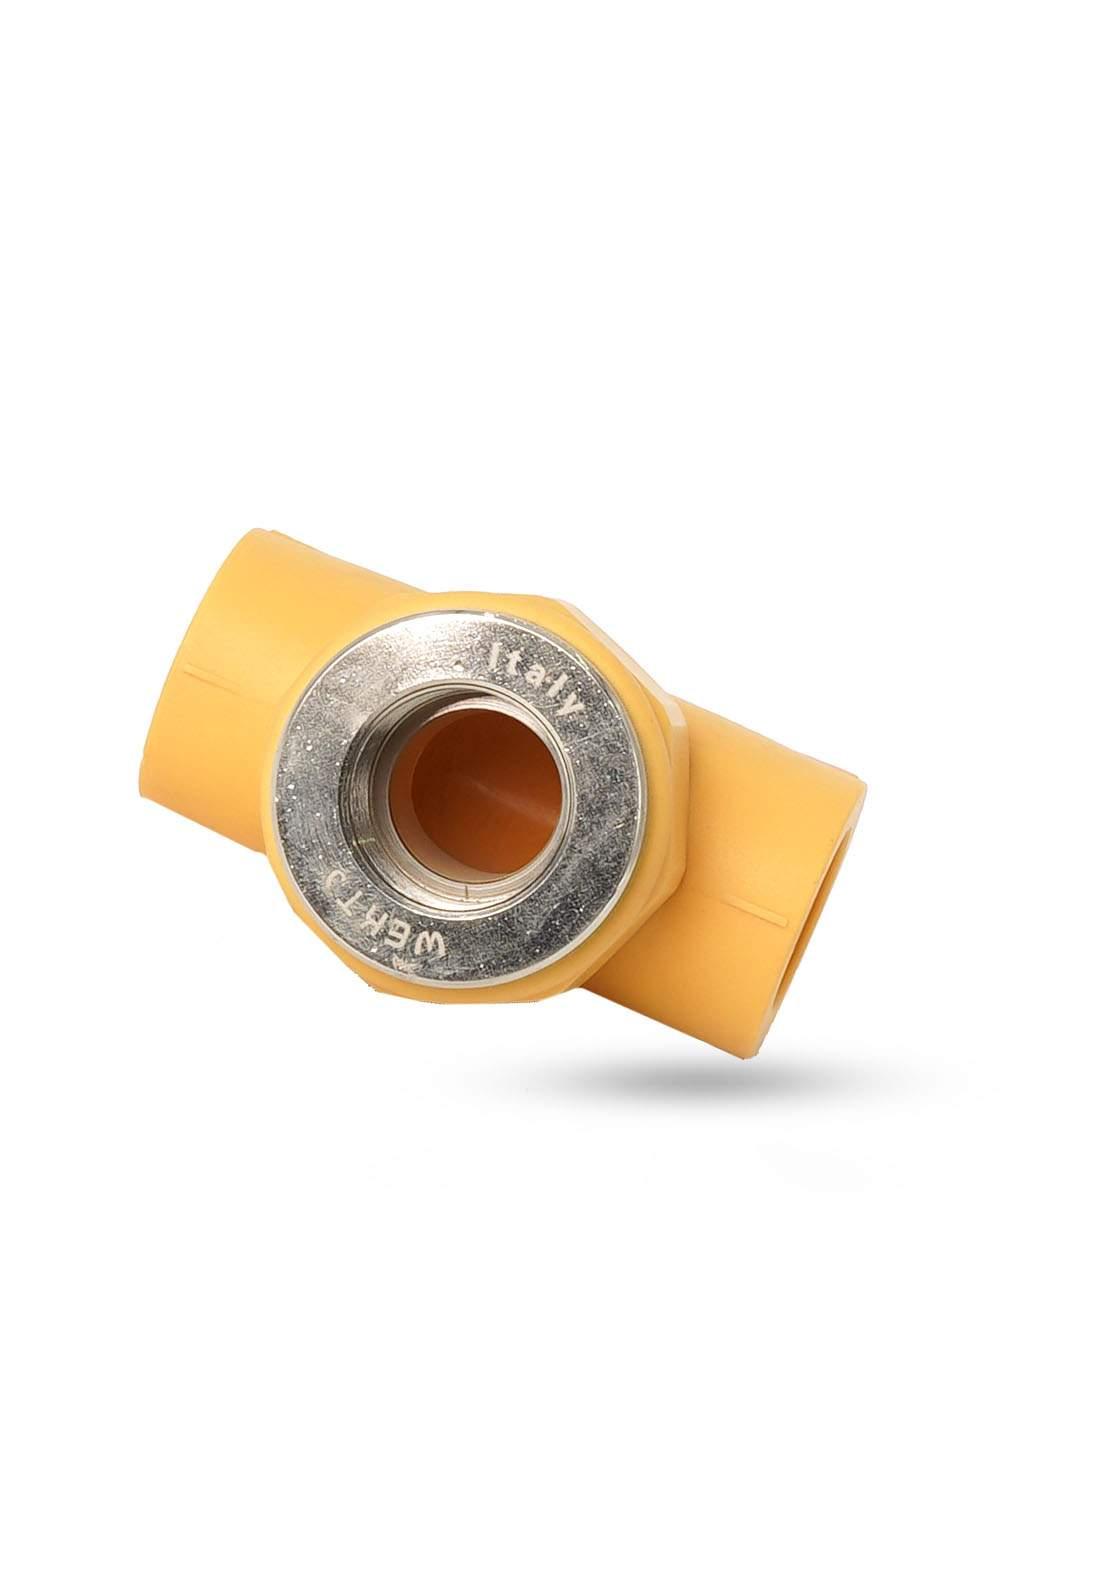 "Wekts 4354 Tooth Separator for water pipes 25  x 1/2"" تقسيم سن داخلي لأنابيب المياه"